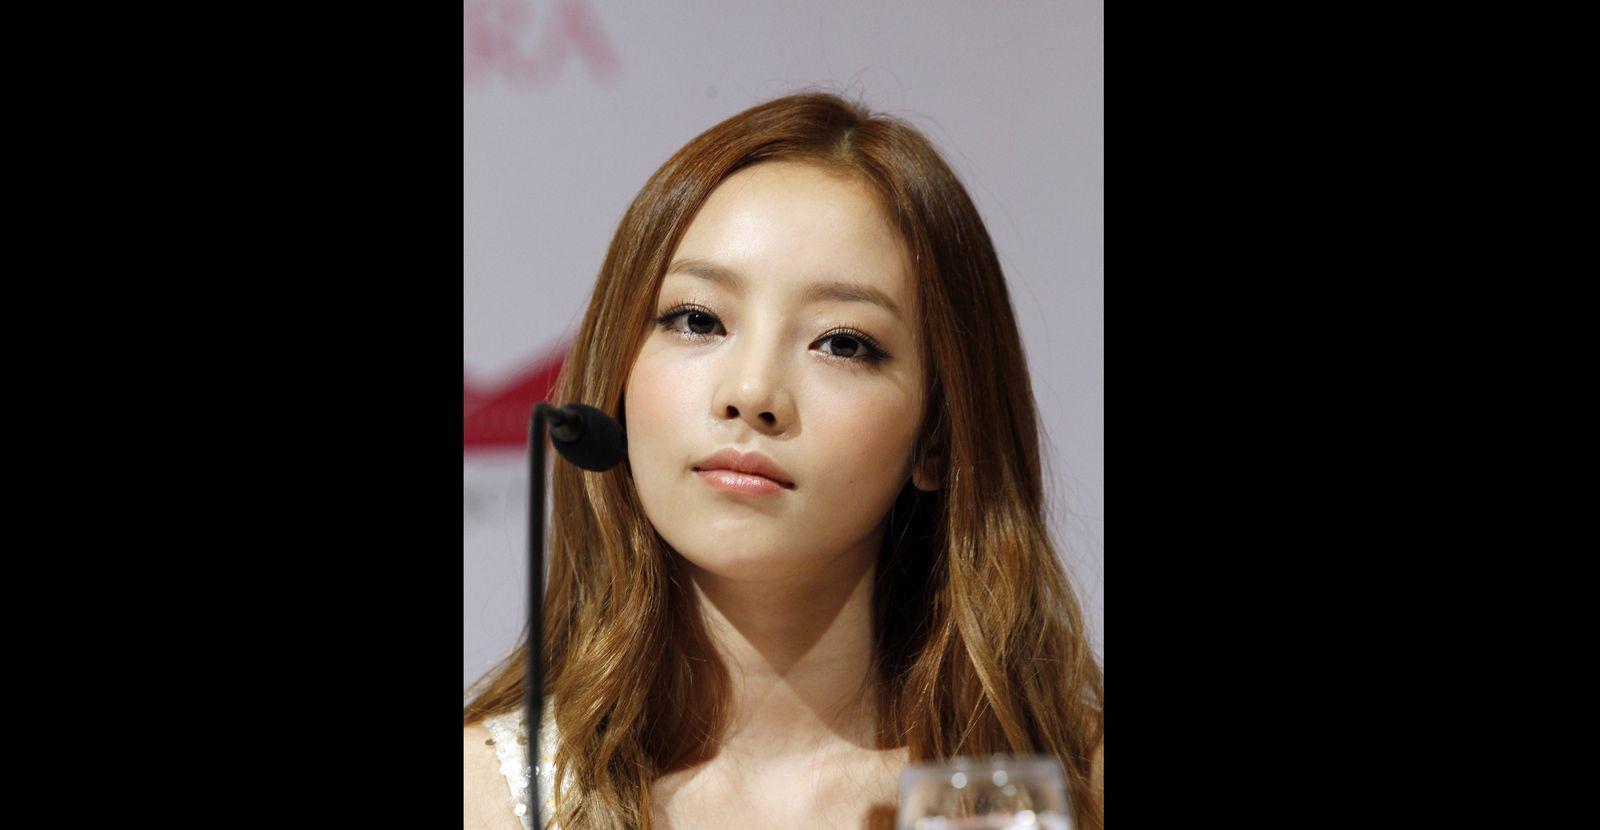 South Korea Pop Star Dead